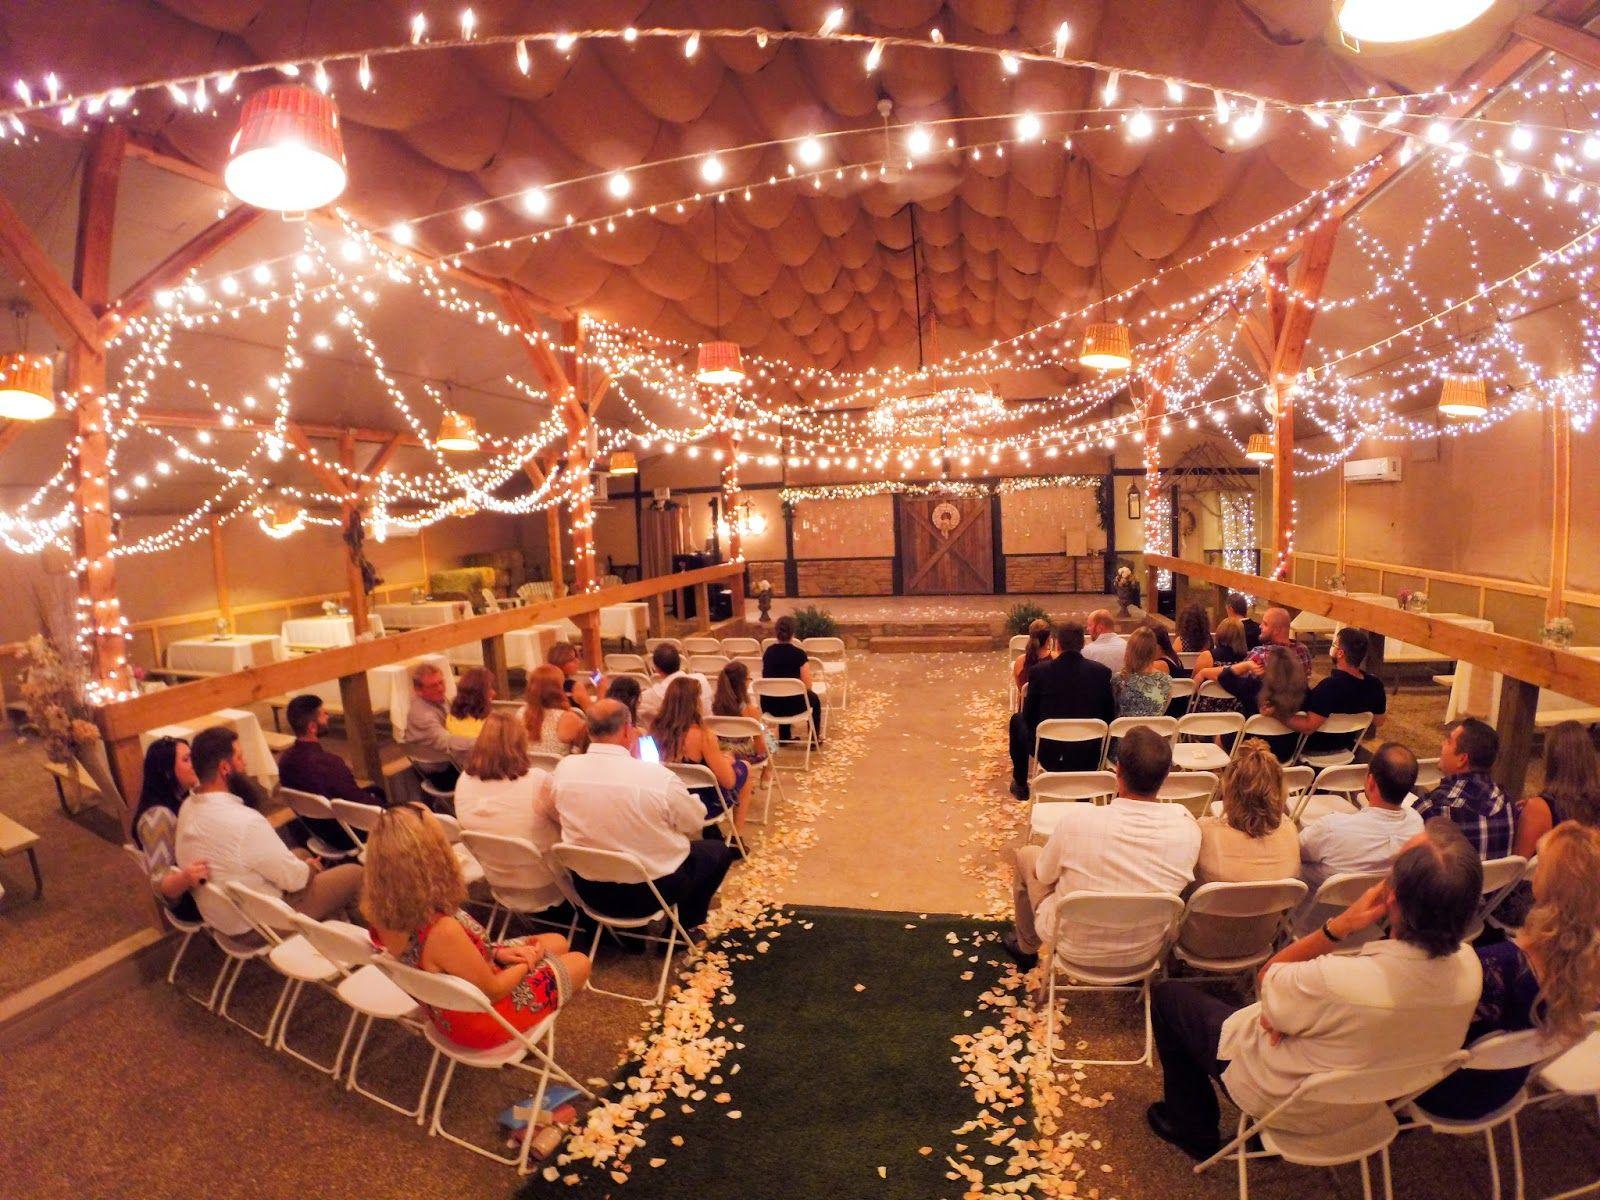 DJ Mark's Chattanooga Weddings (With images) Barn